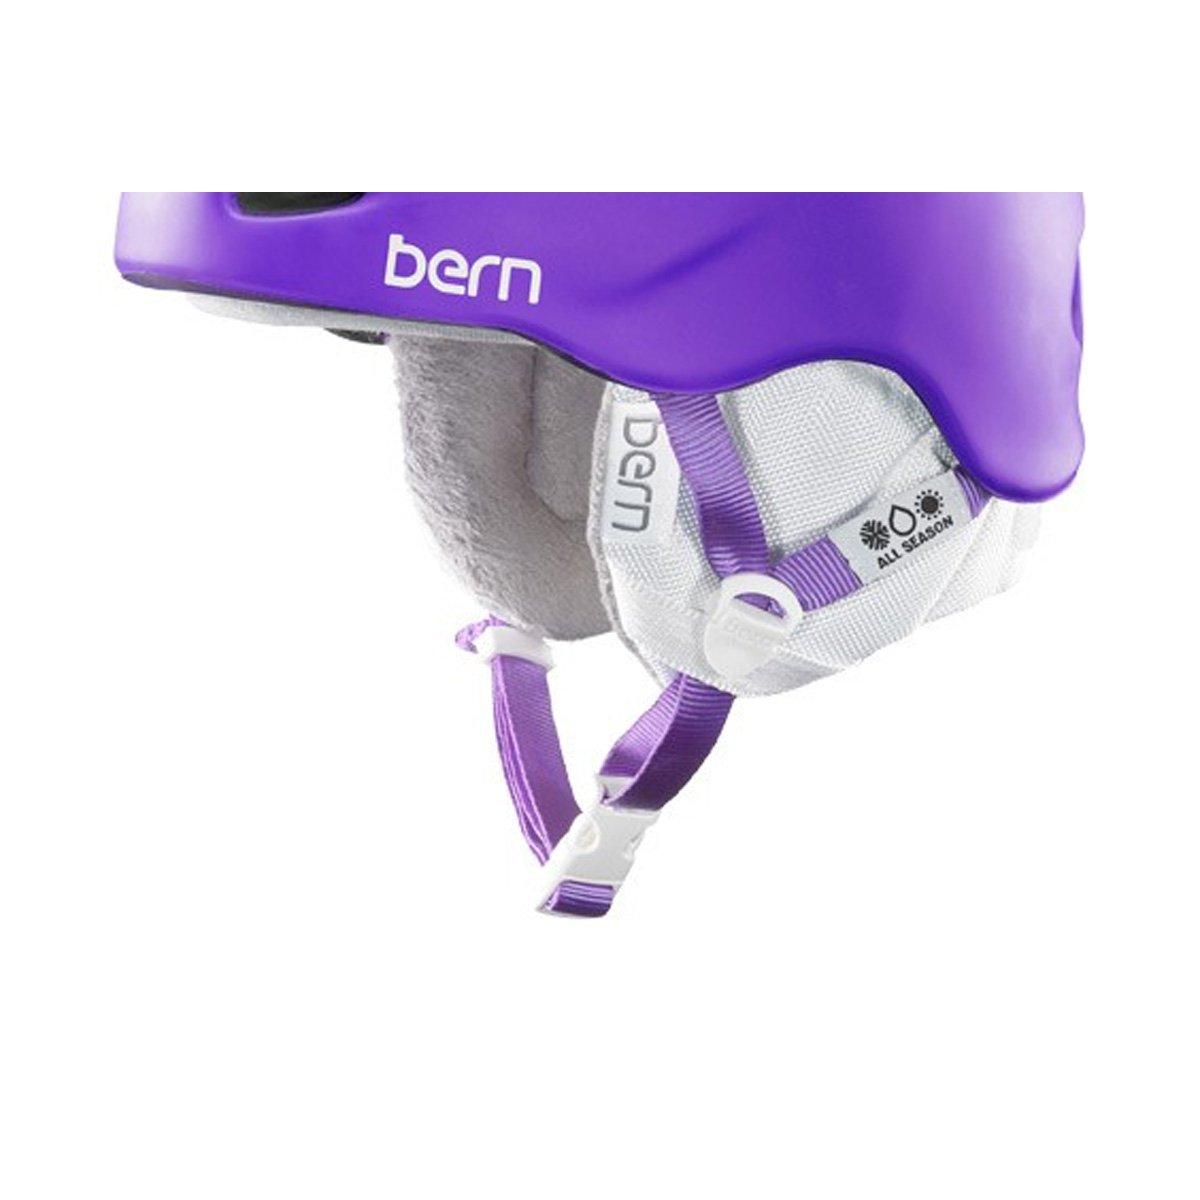 Bern HECCCWML Accessoire Casque vélo Femme, Gris, M/L BEROG|#Bern HECCWML